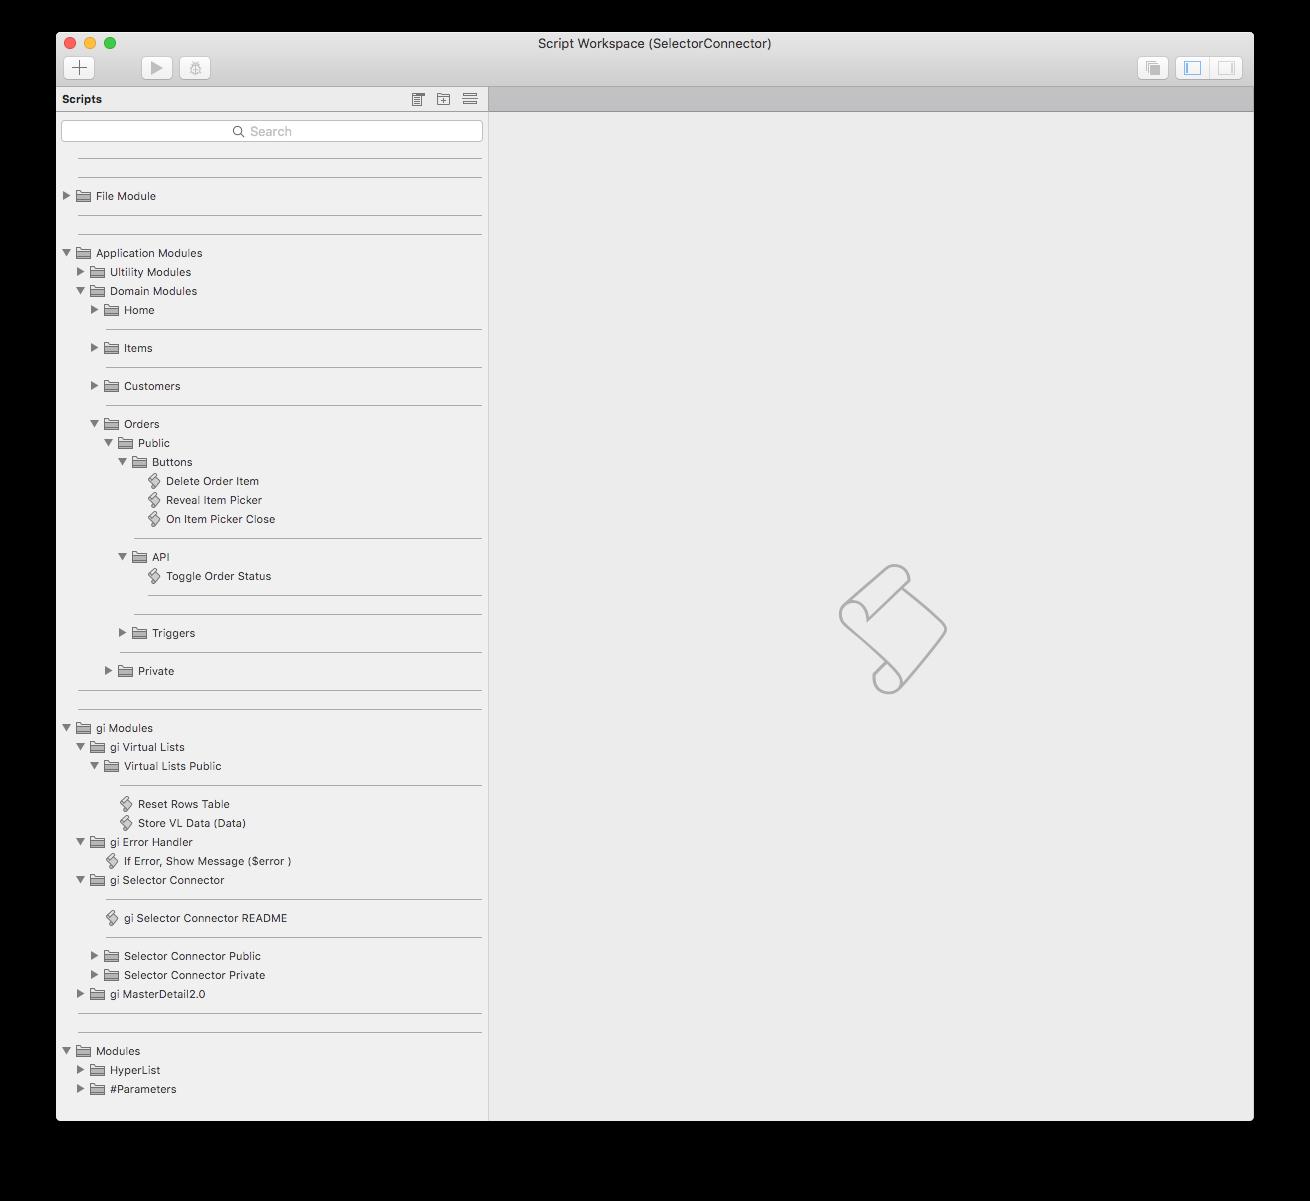 script-workspace-selectorconnector